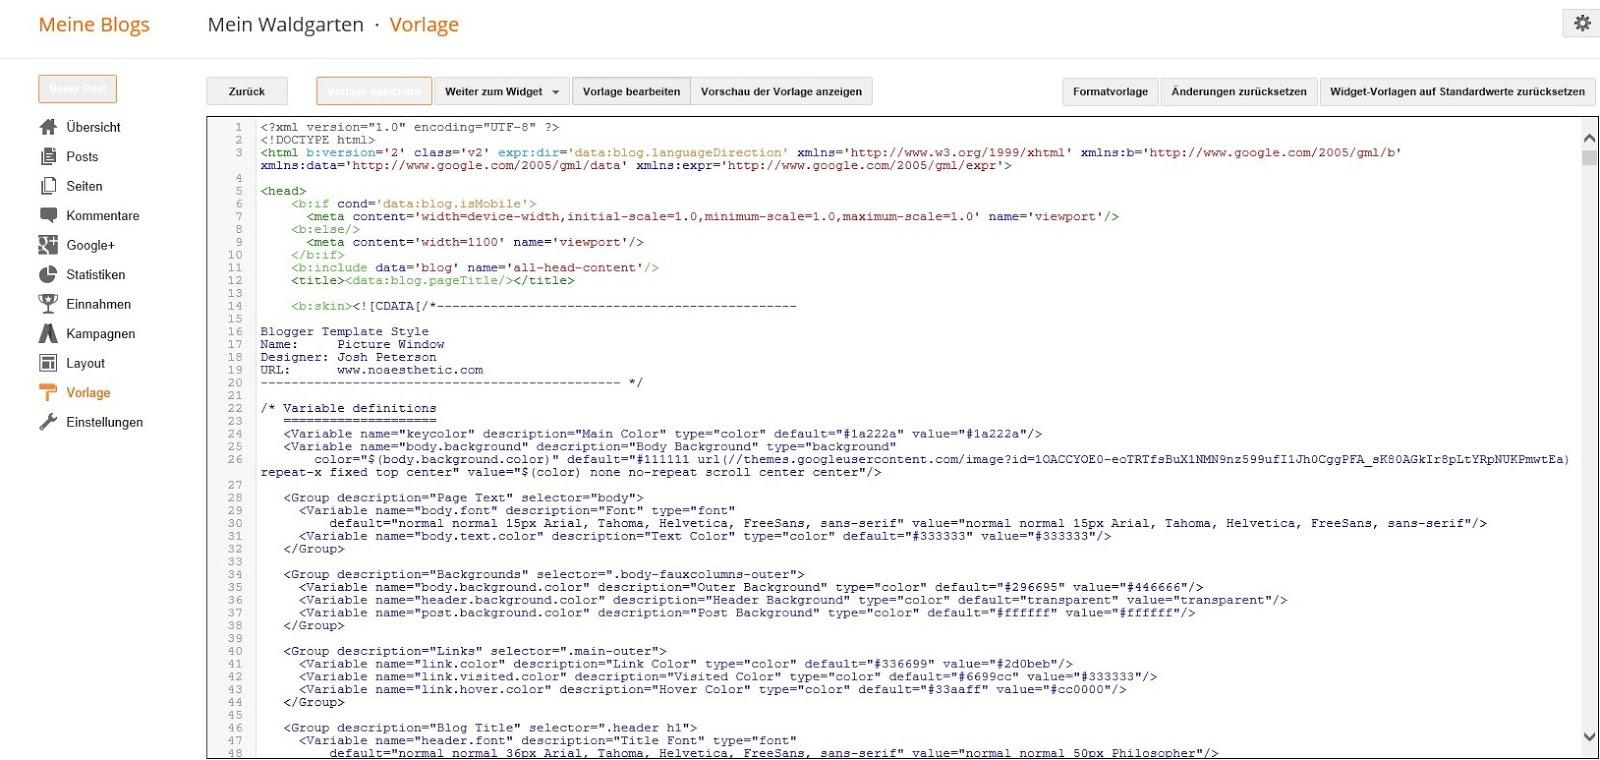 Blog-Helper - Blogger/Blogspot: Suche im Blogger-HTML-Editor!